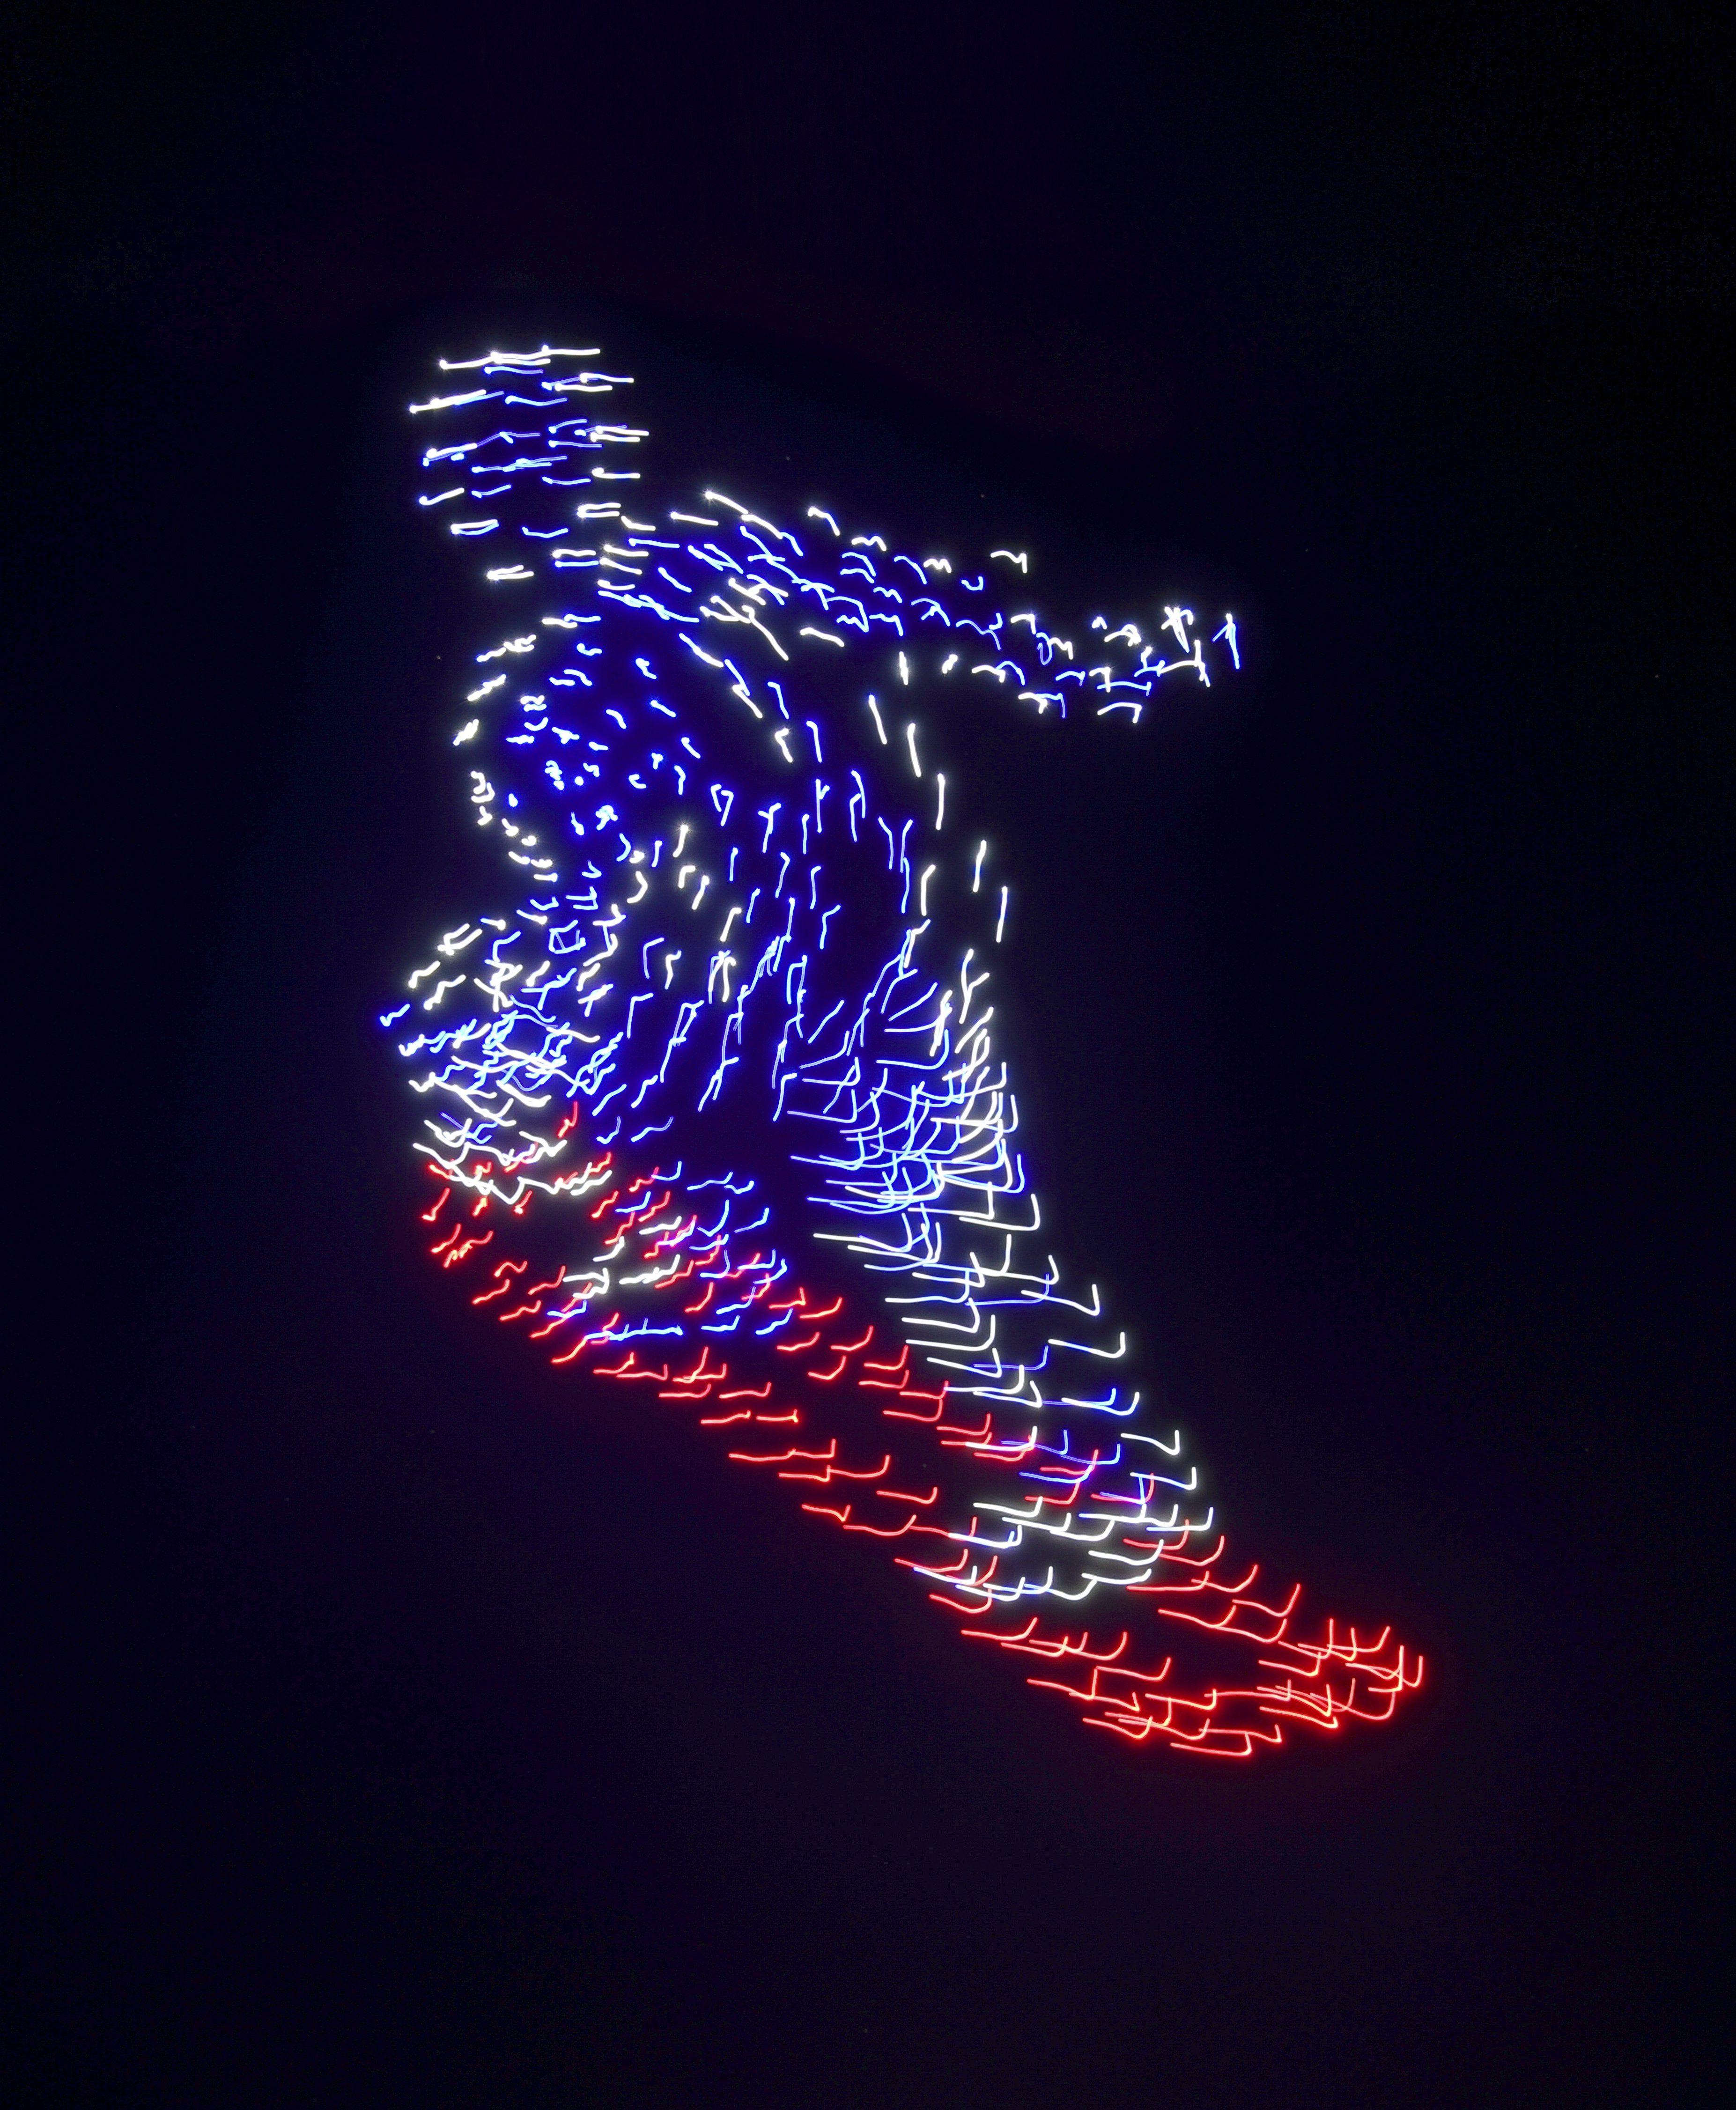 Intel-2018-Olympics-Drone-Ligh-Show-4